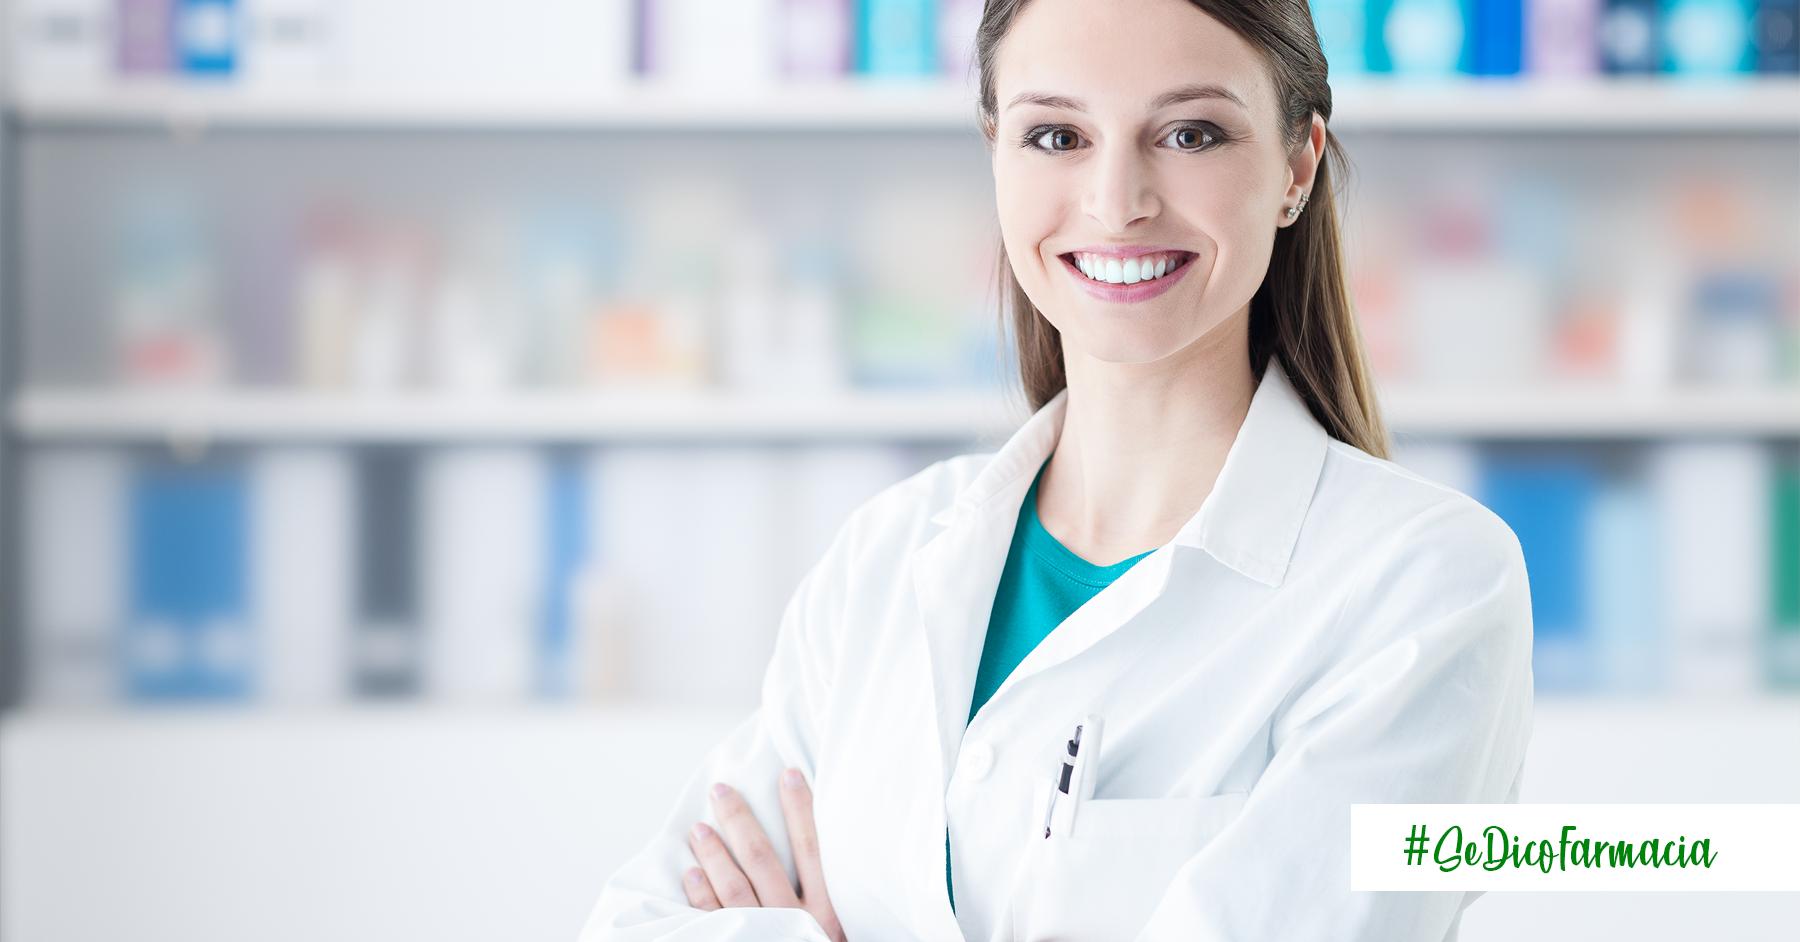 http://www.farmaciaserafini.net/wp-content/uploads/2019/10/ruolo_farmacista.png